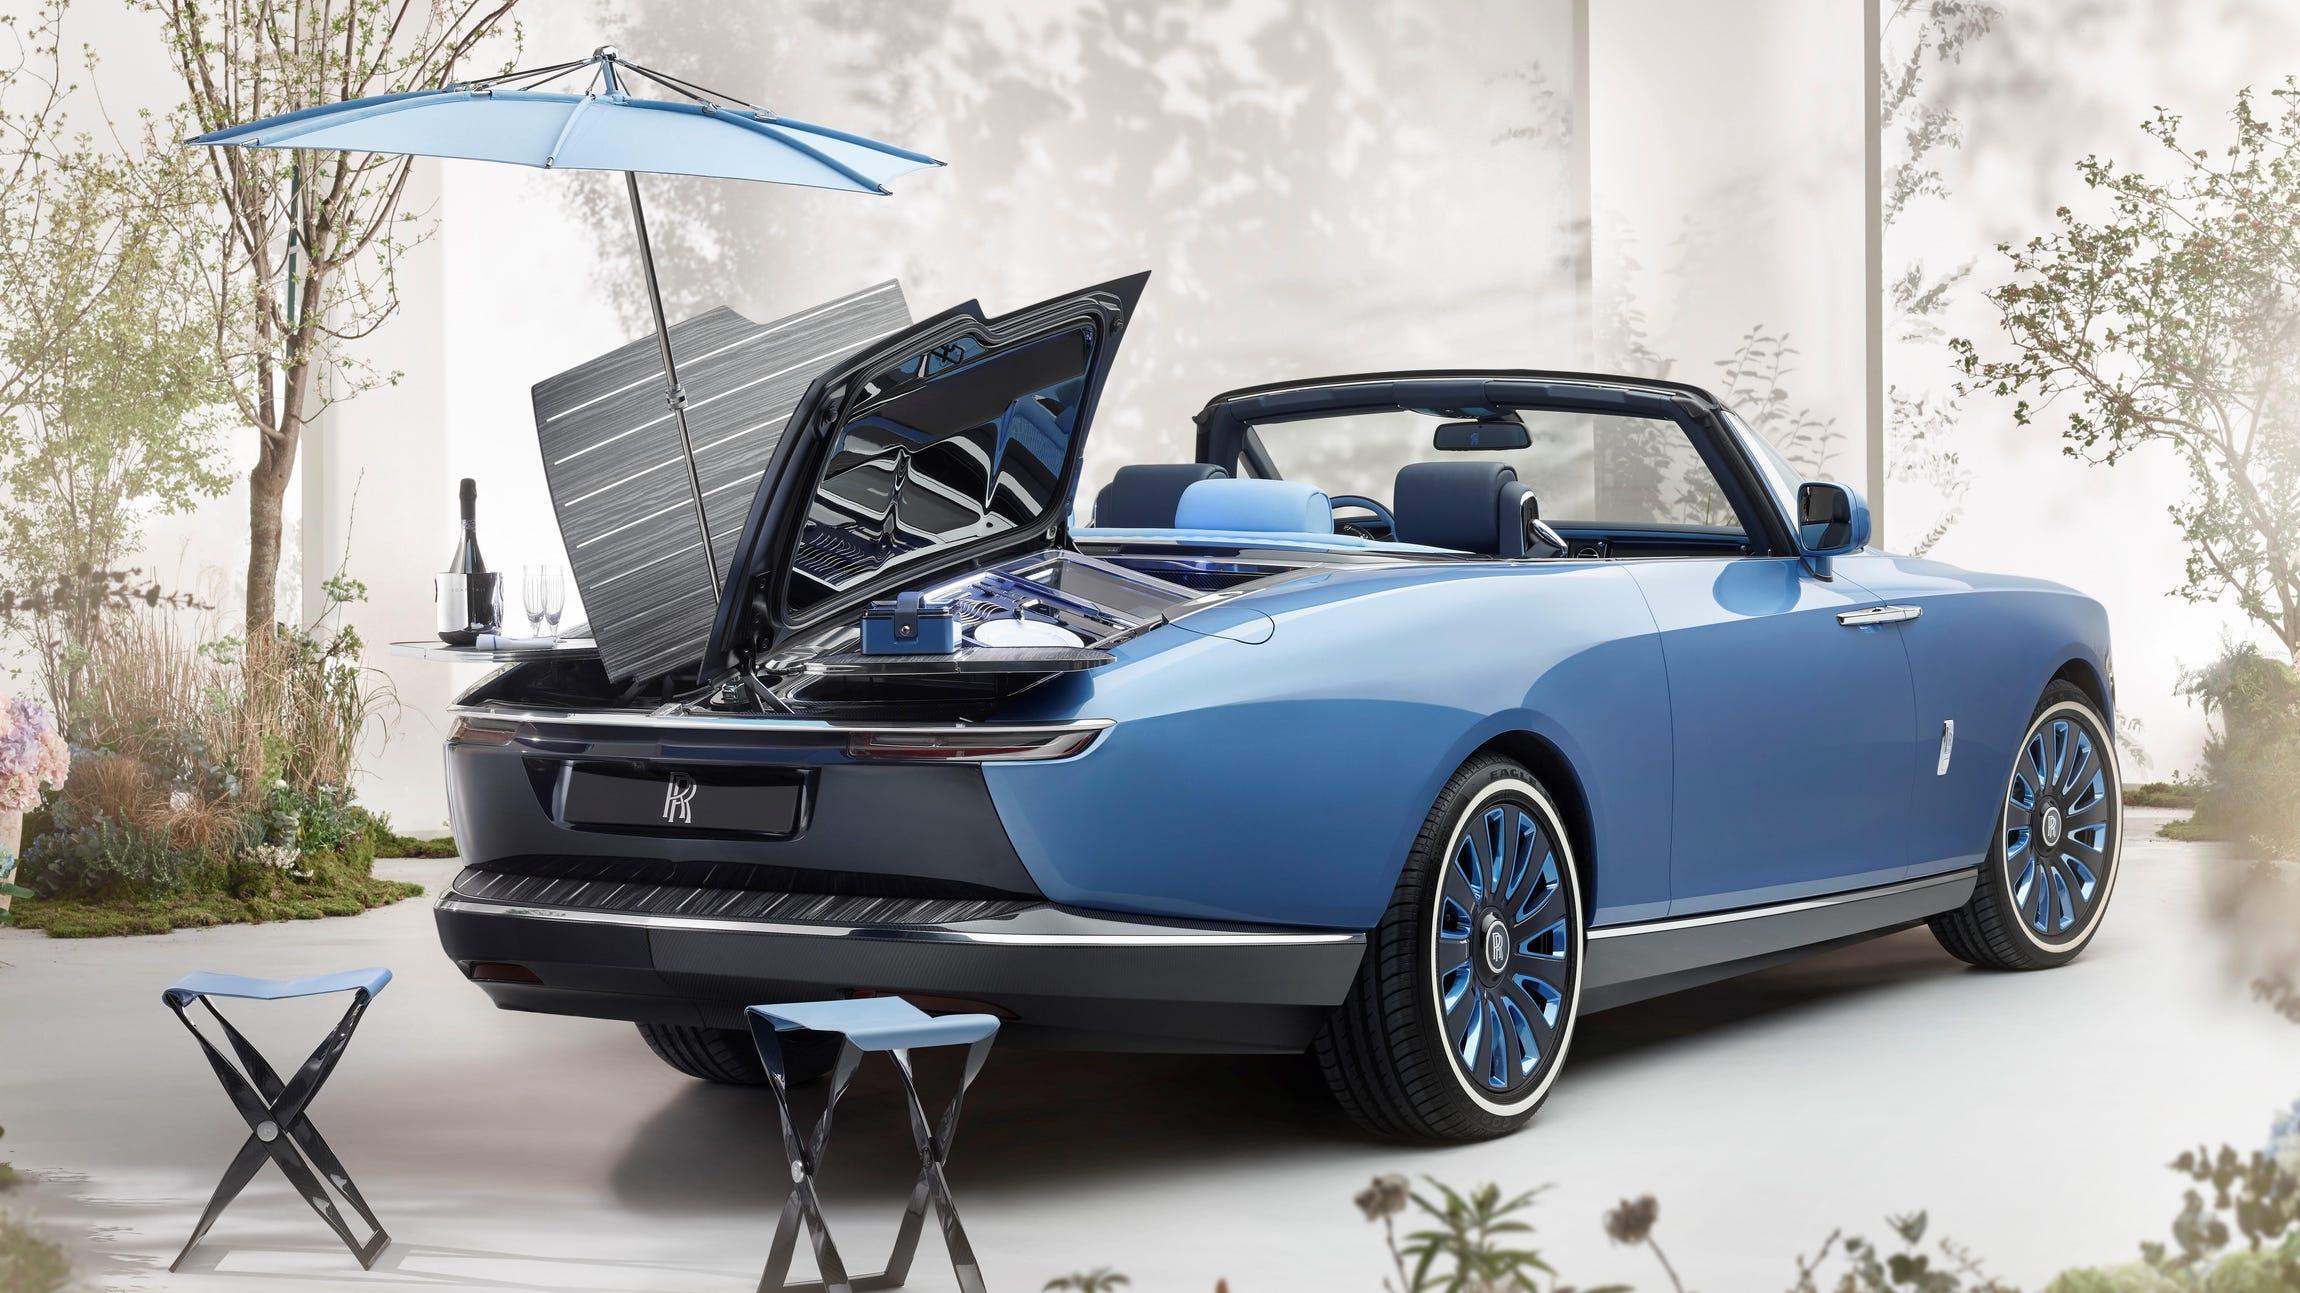 rolls-royce-boat-tail-coachbuilt-bespoke-one-off-convertible-120